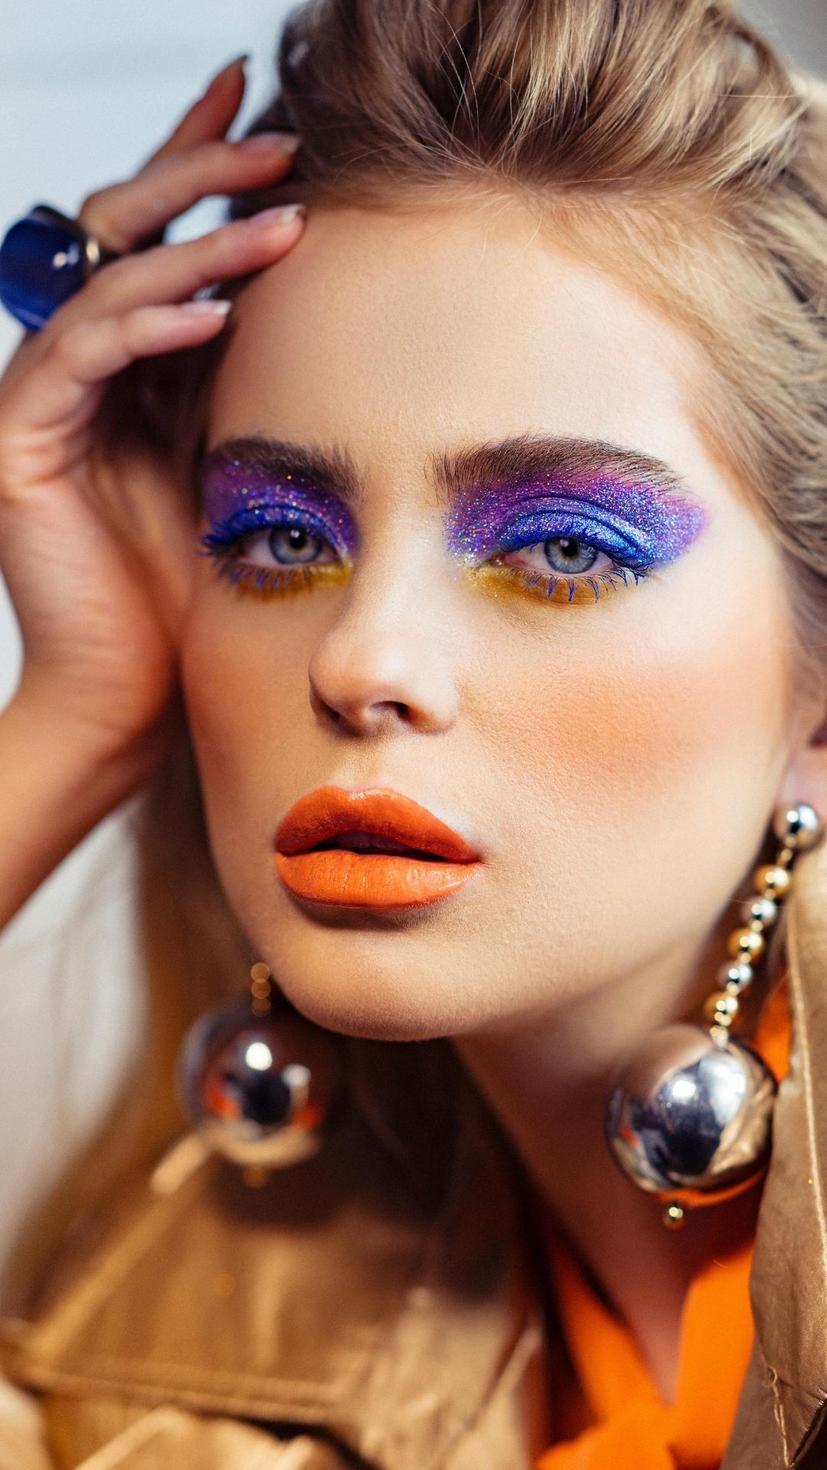 Makeup, Beauty, SS20, Euphoria Makeup, Get the look, Glitter Eyeshadow, Bold makeup